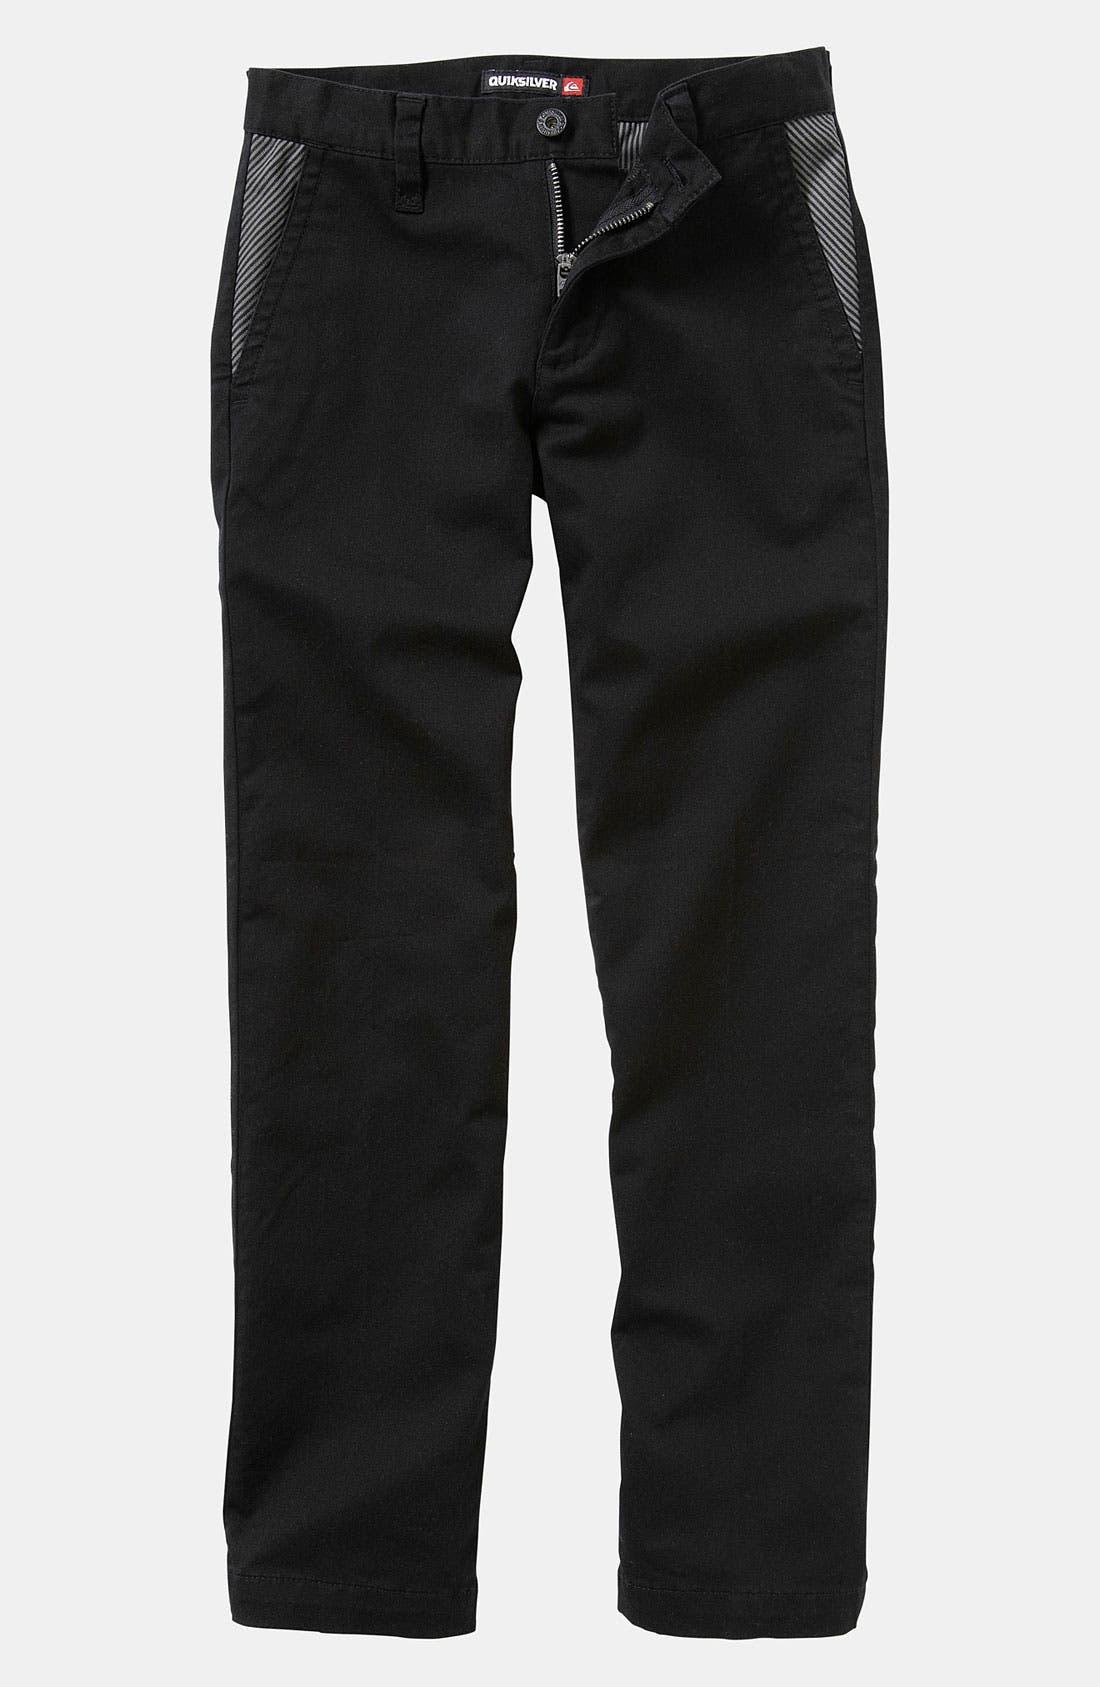 Alternate Image 1 Selected - Quiksilver 'Box Wire' Slim Straight Leg Chino Pants (Big Boys)